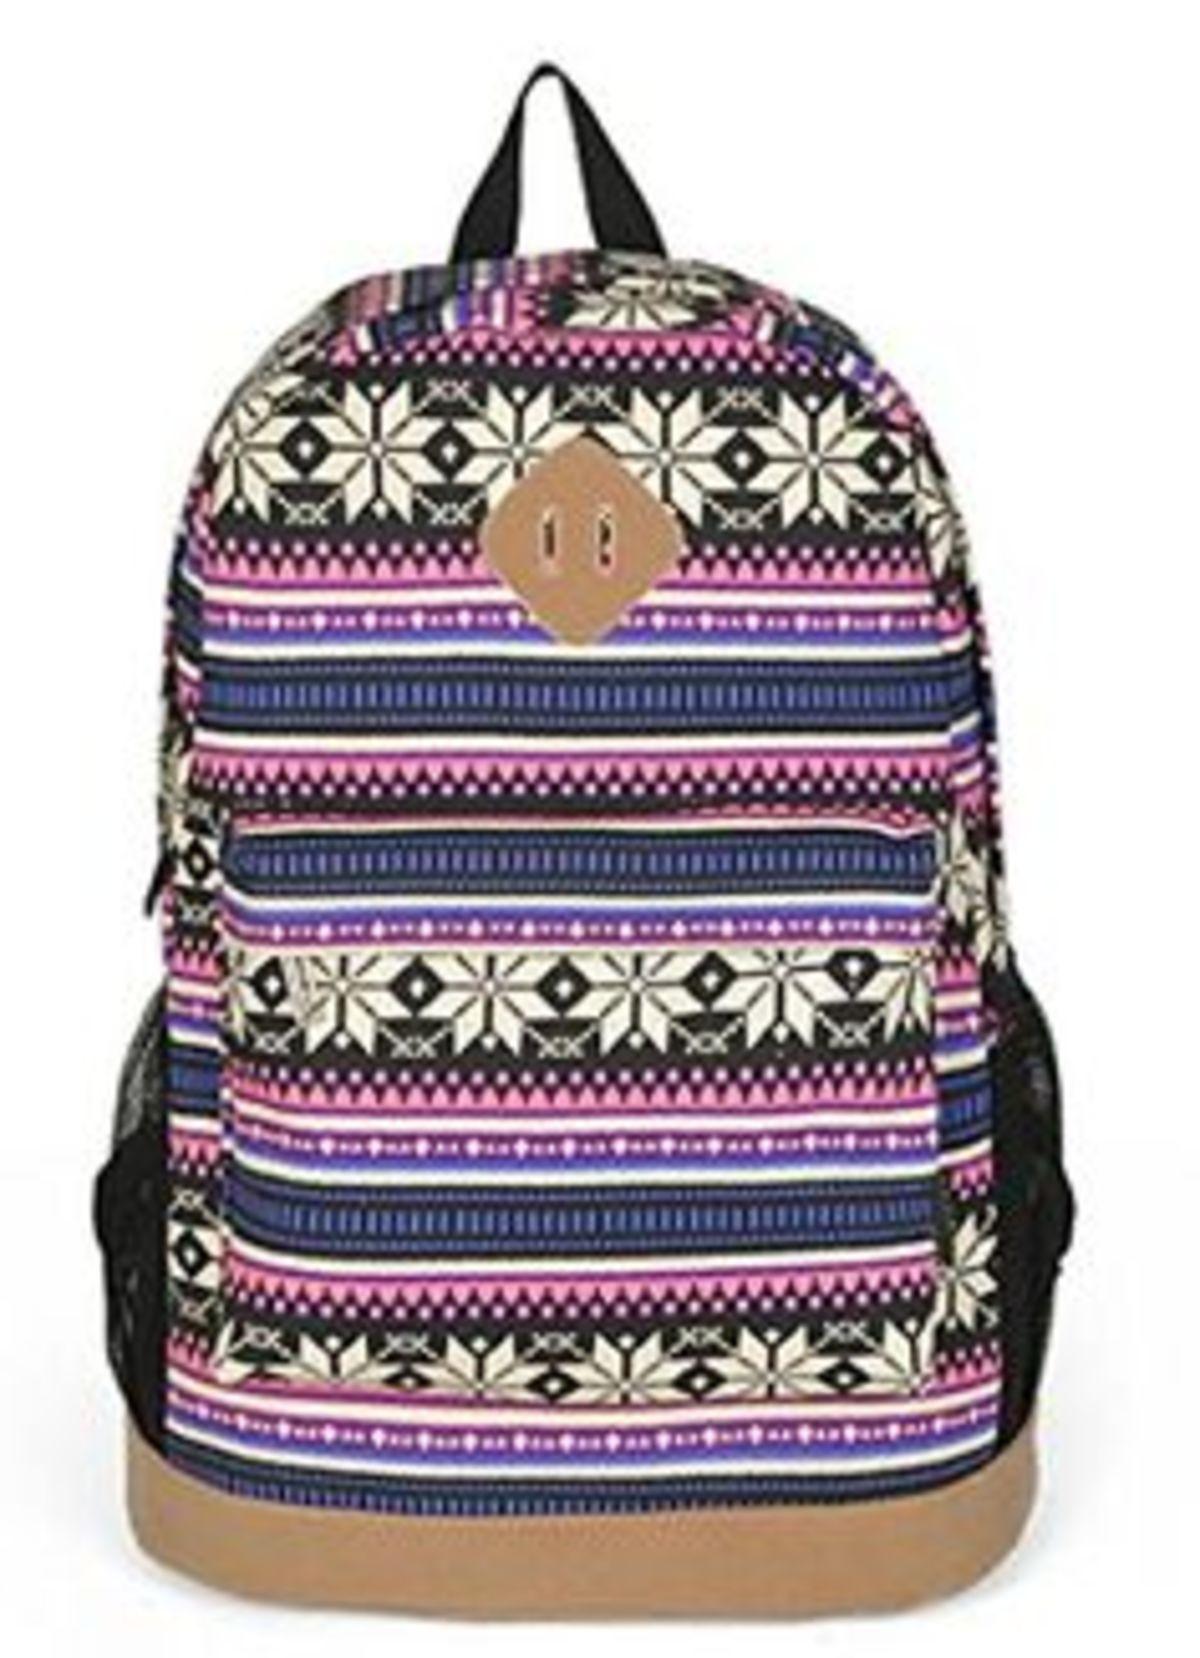 Coolest Backpacks For Girls - Backpack Her